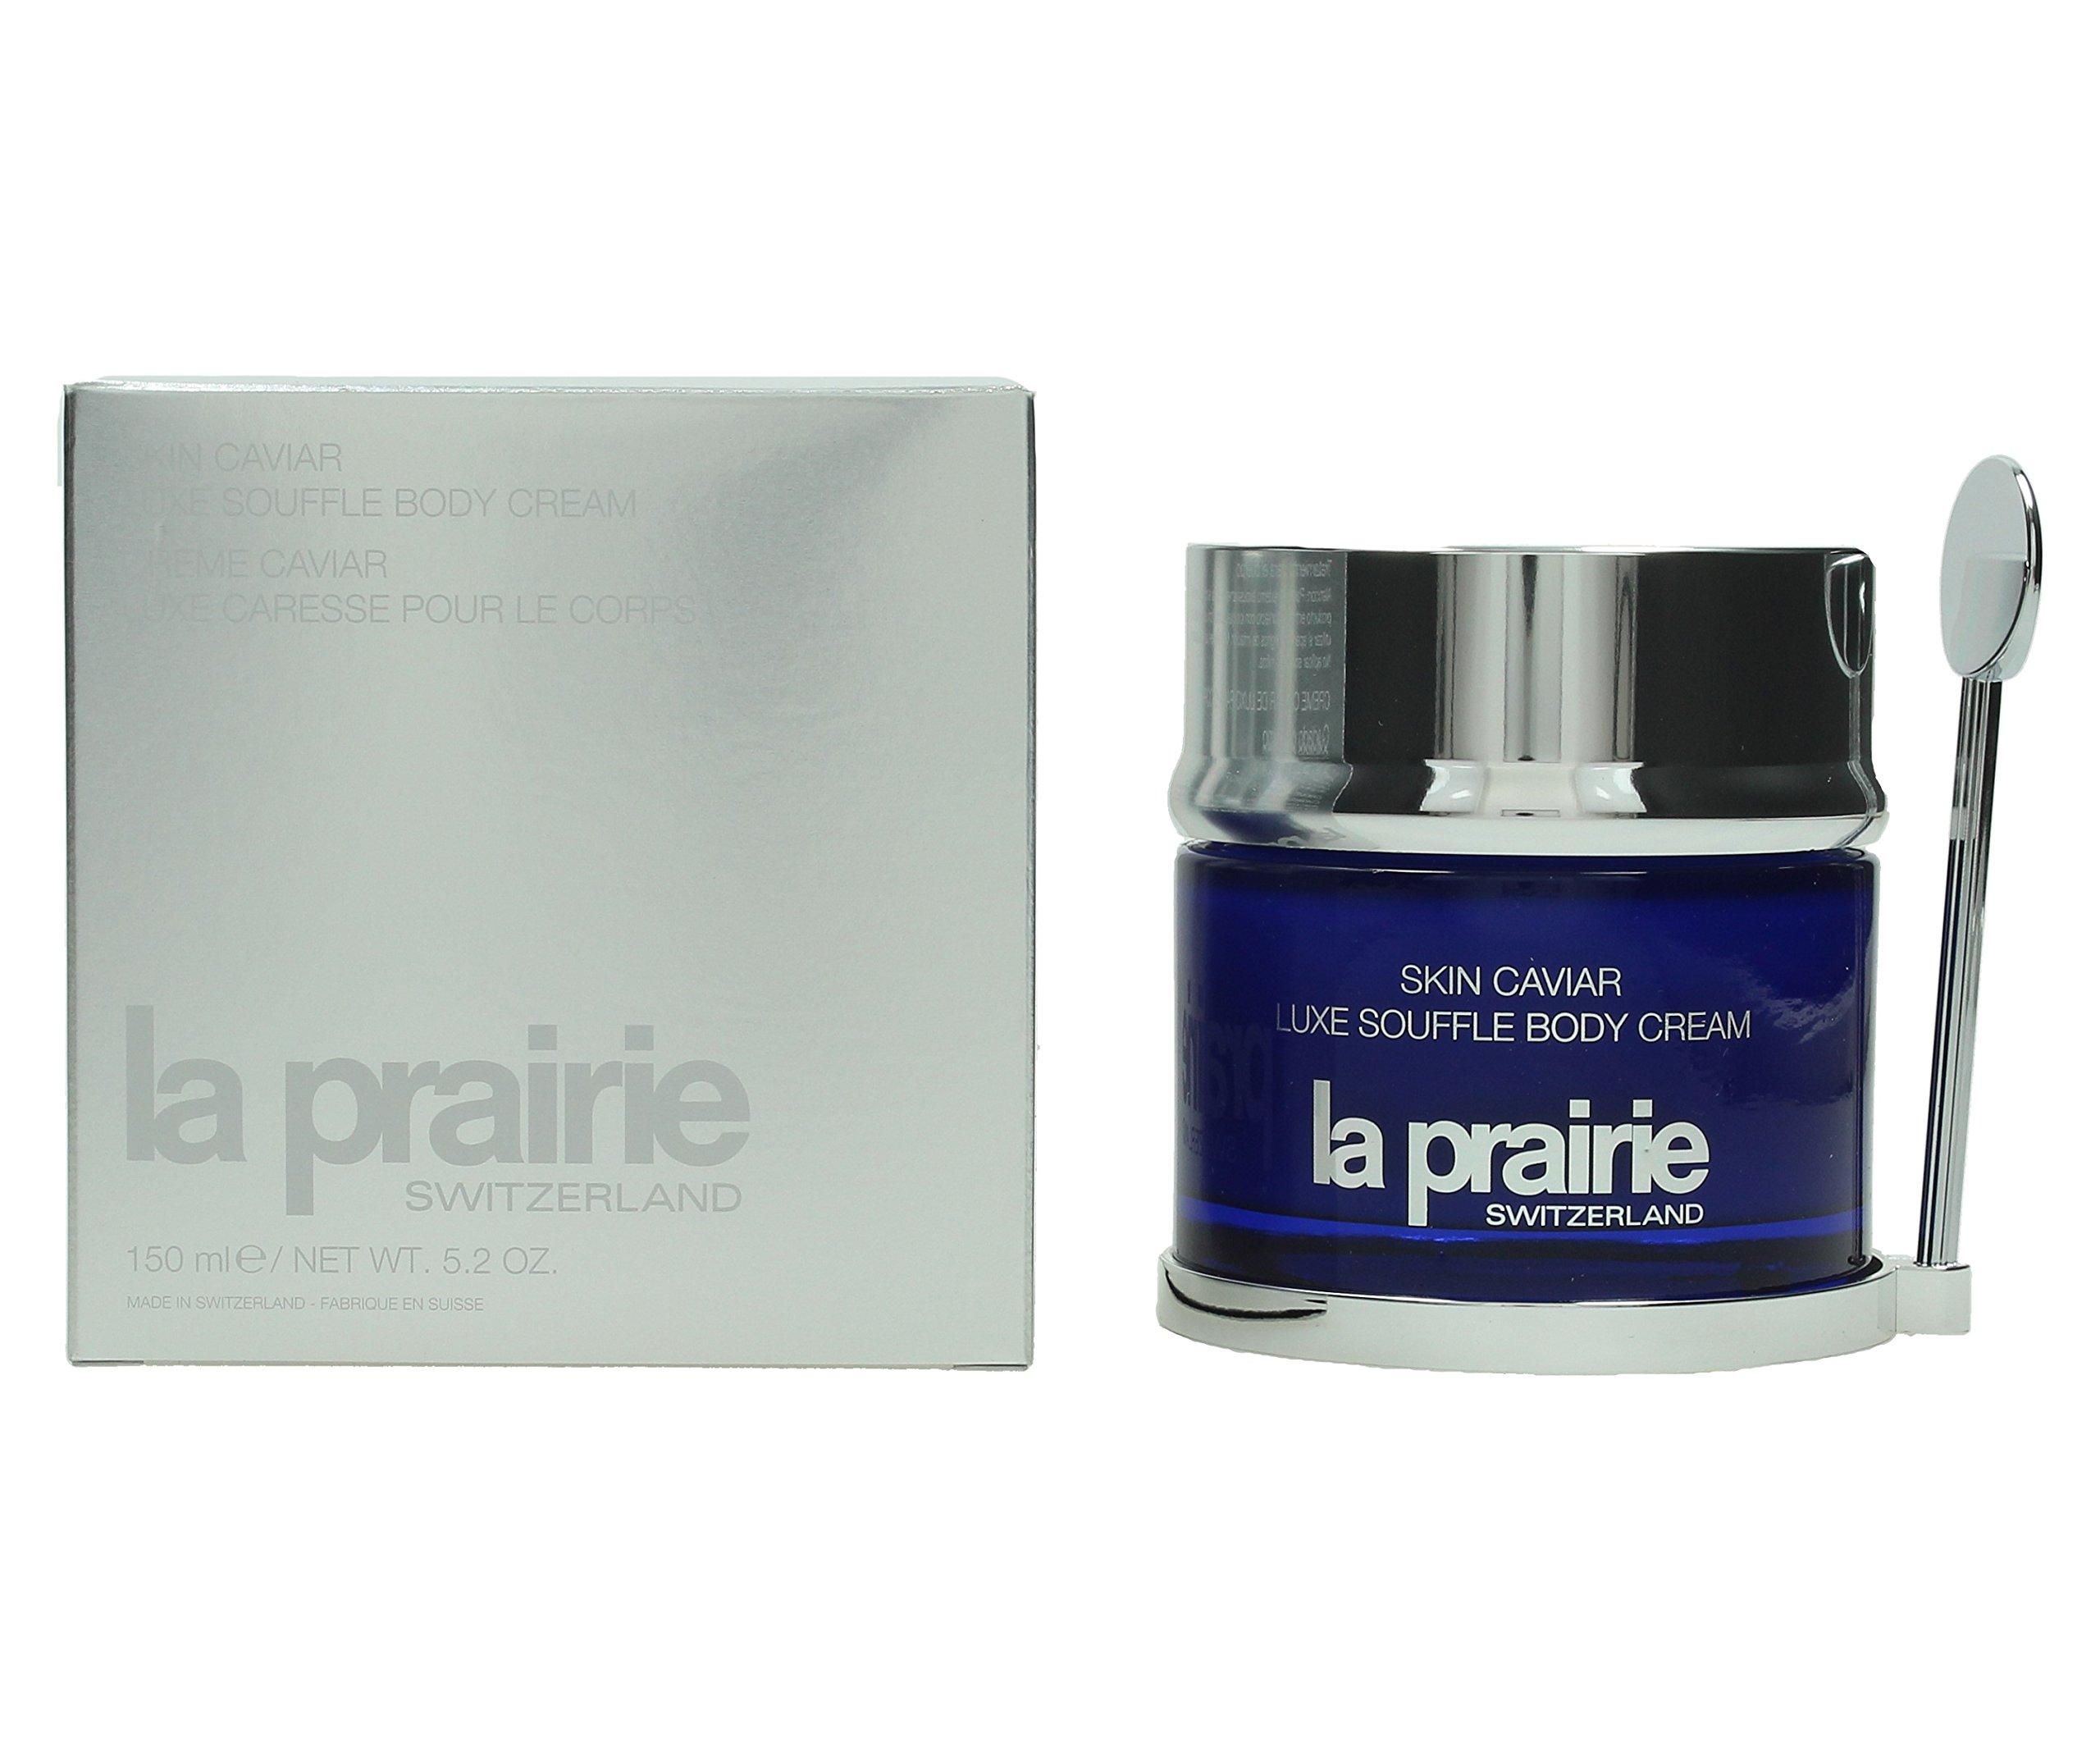 La Prairie Skin Caviar Luxe Souffle Body Cream for Women, 5.2 Ounce